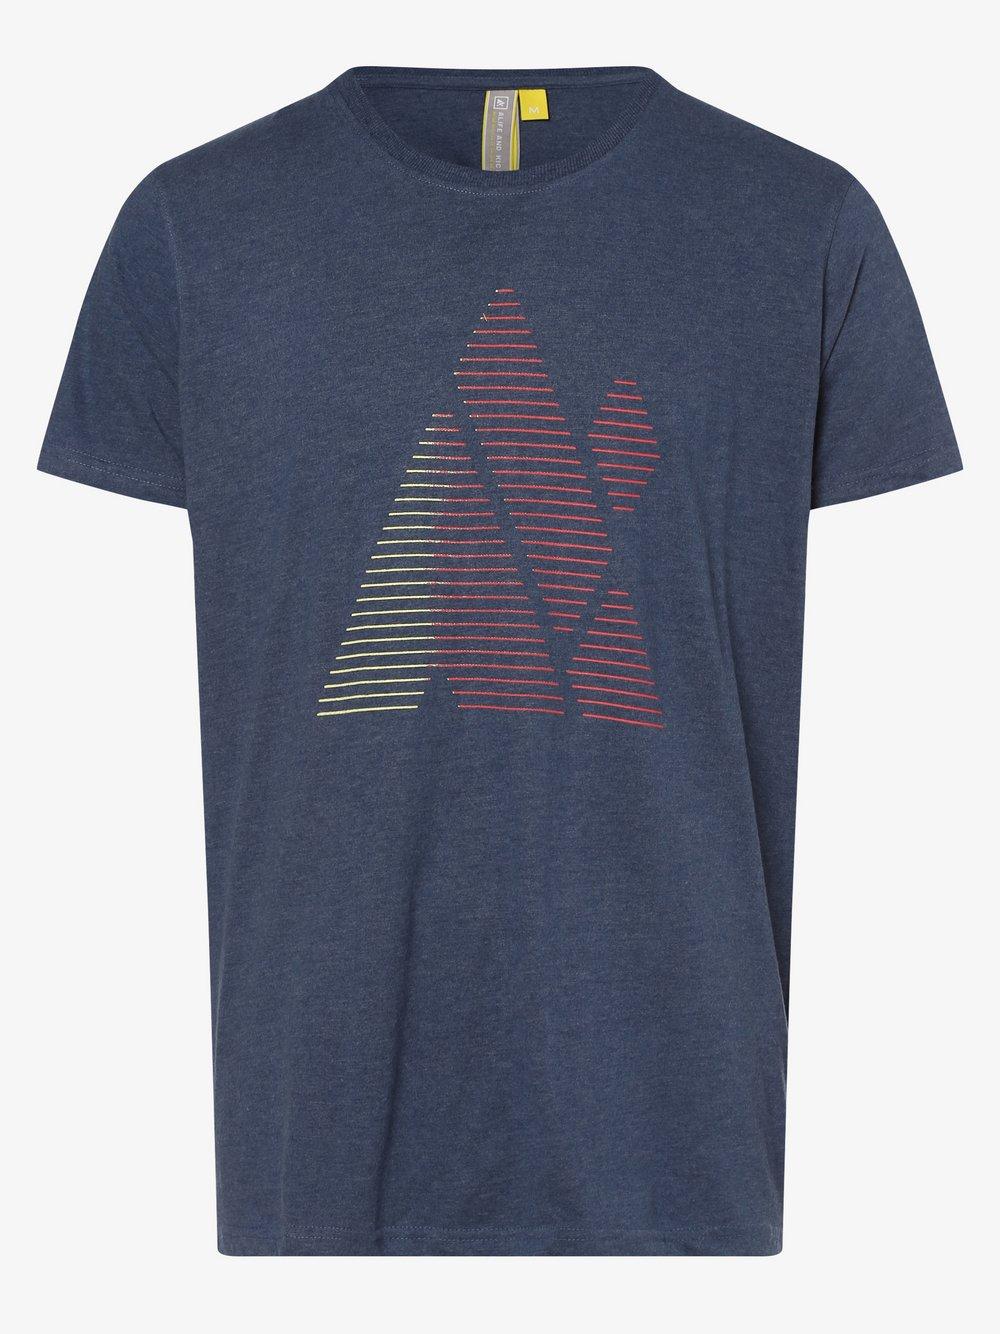 alife and kickin – T-shirt męski – Logo ICON AK, niebieski Van Graaf 495779-0002-09900